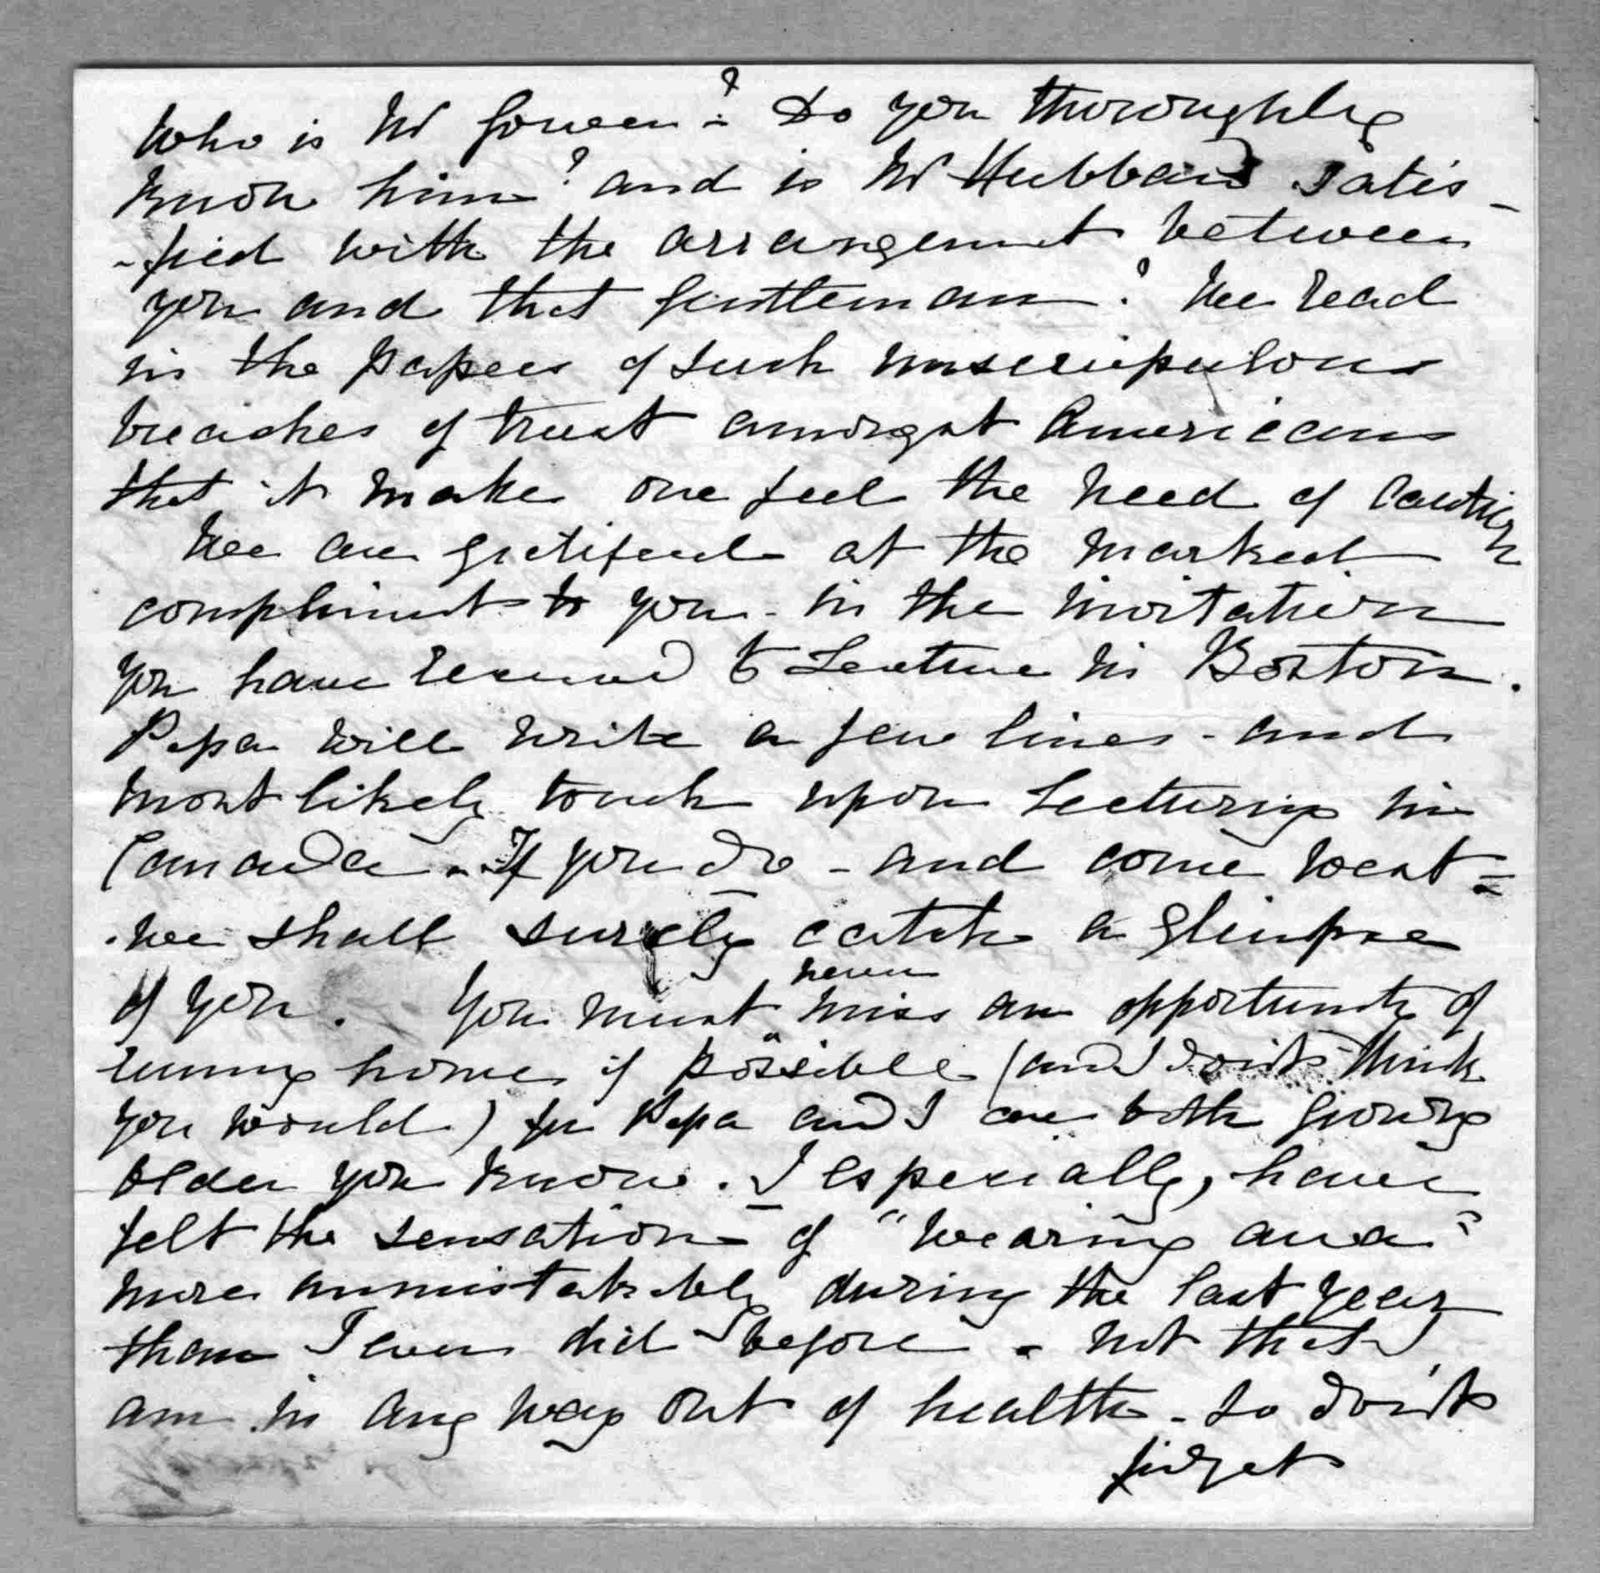 Letter from Eliza Symonds Bell to Alexander Graham Bell, April 23, 1877